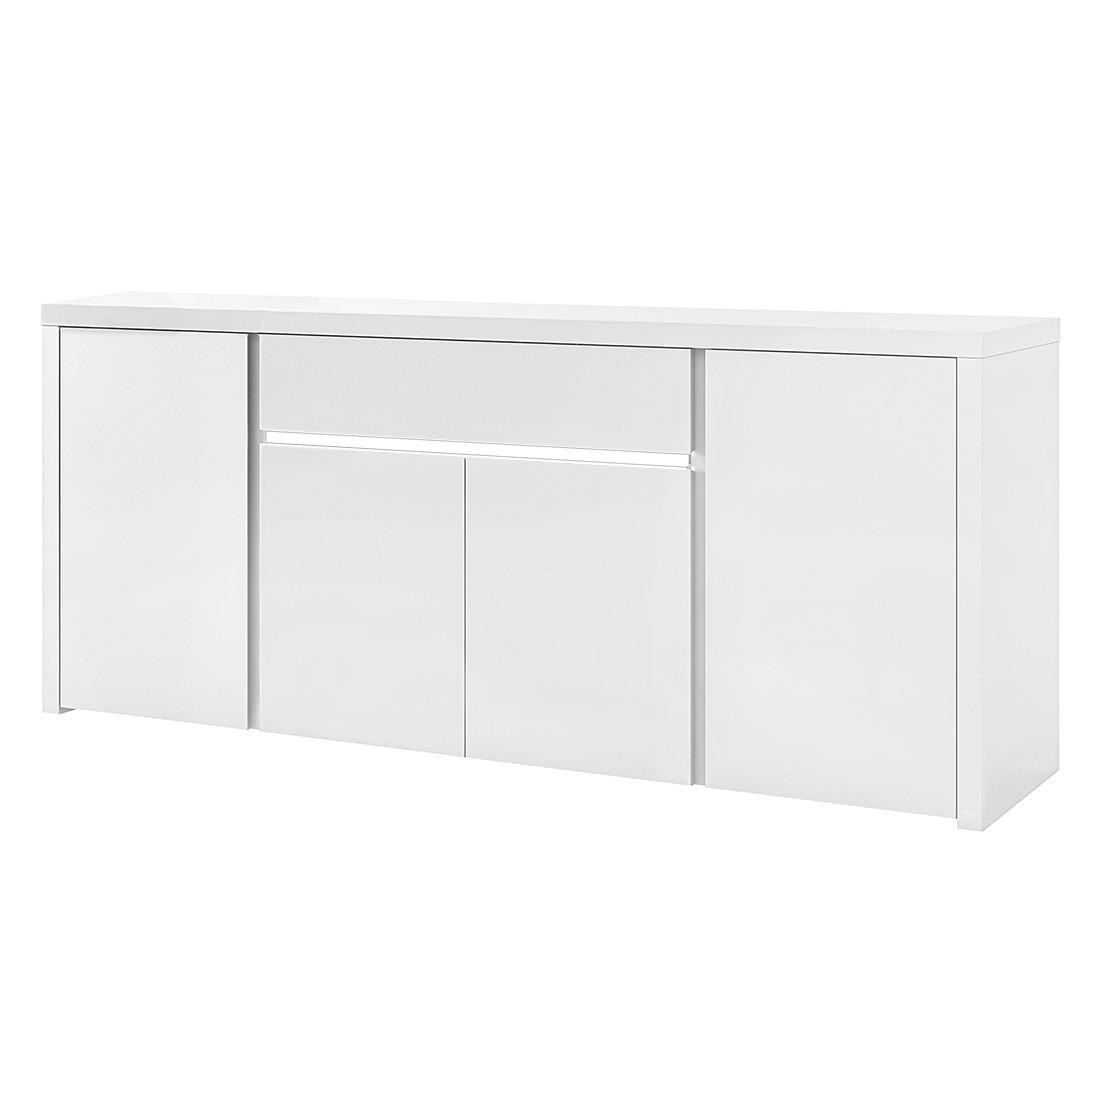 Sideboard 50 cm tief sonstige preisvergleiche for Sideboard 80 cm tief